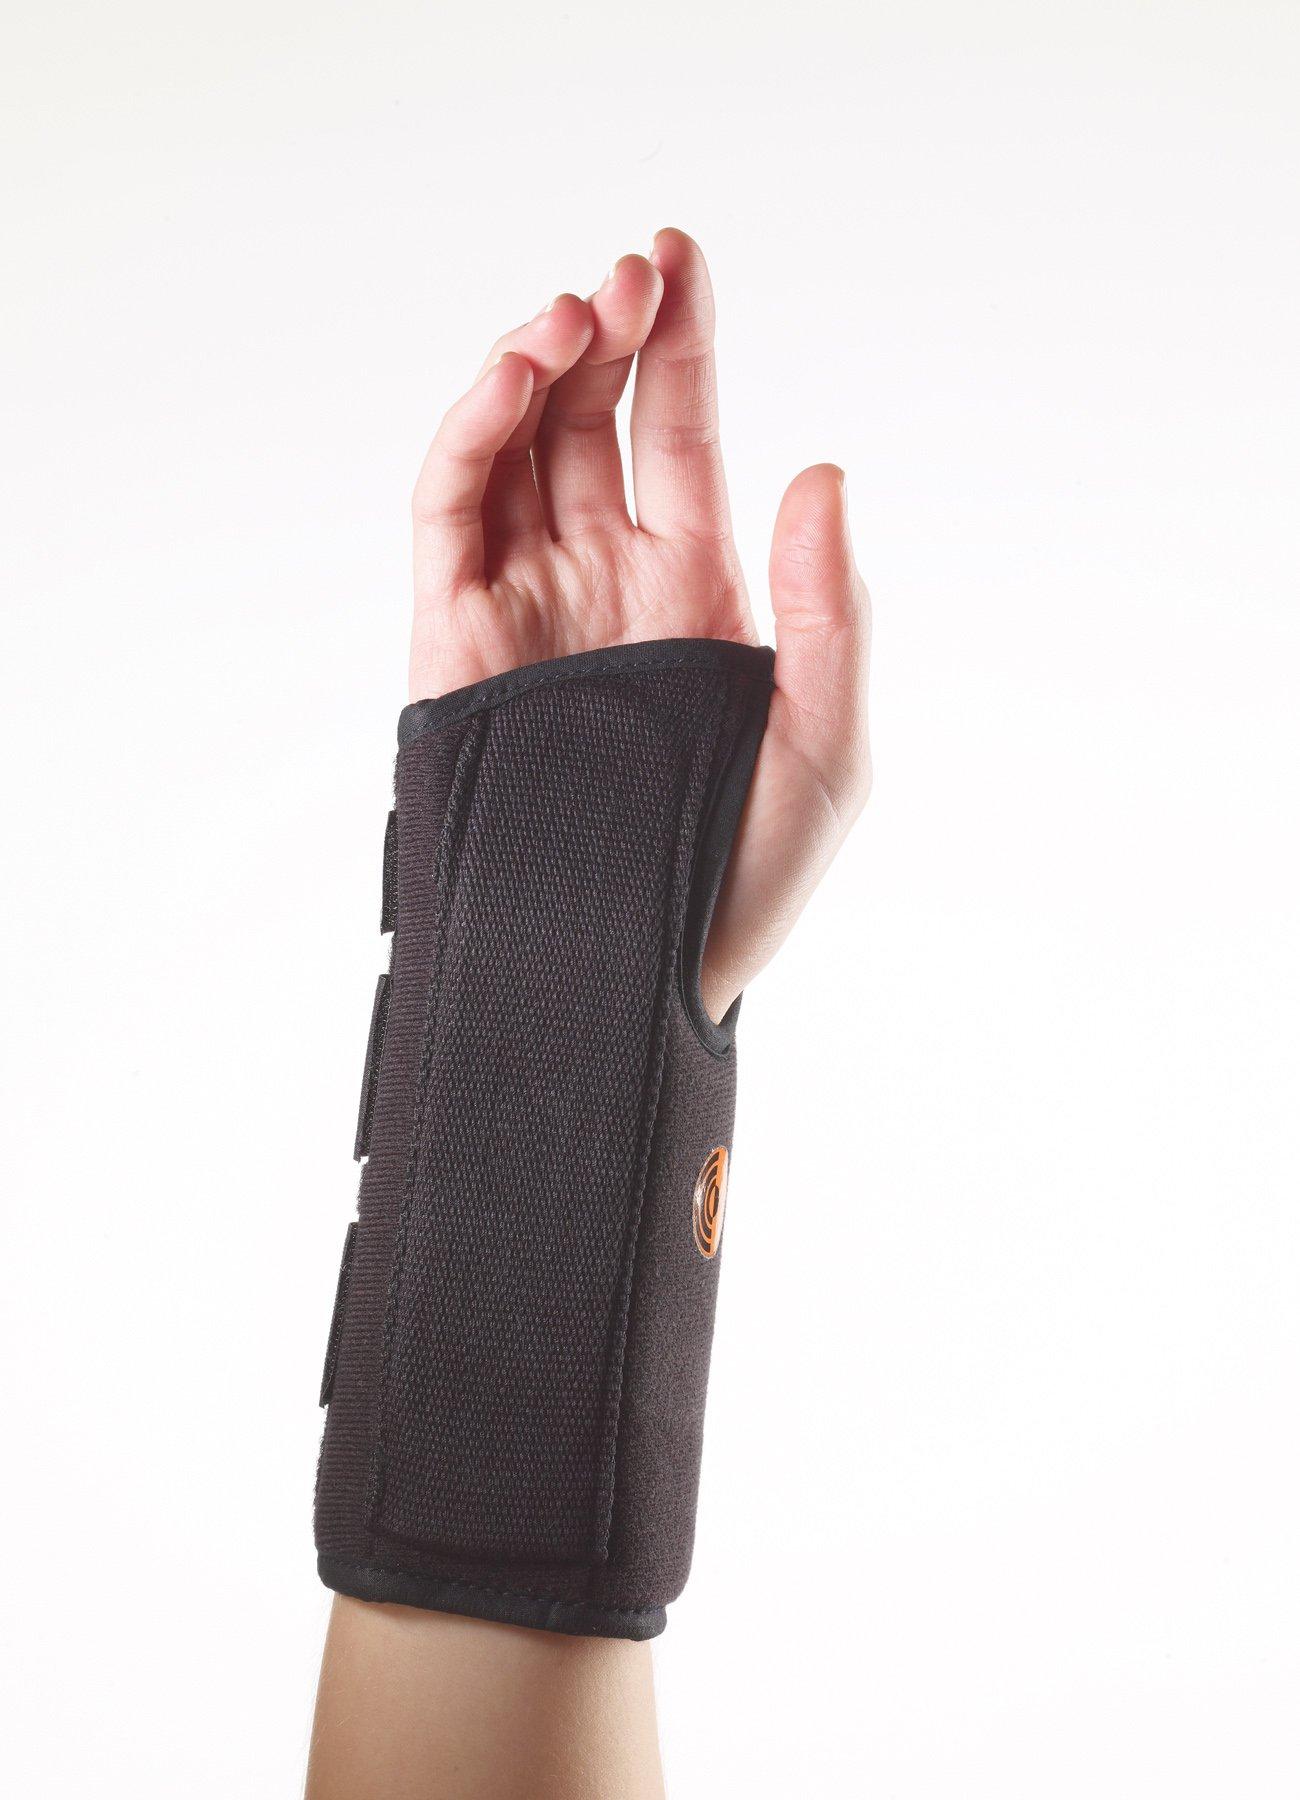 Corflex 8'' Ultra Fit Professional Wrist Support -Small Left